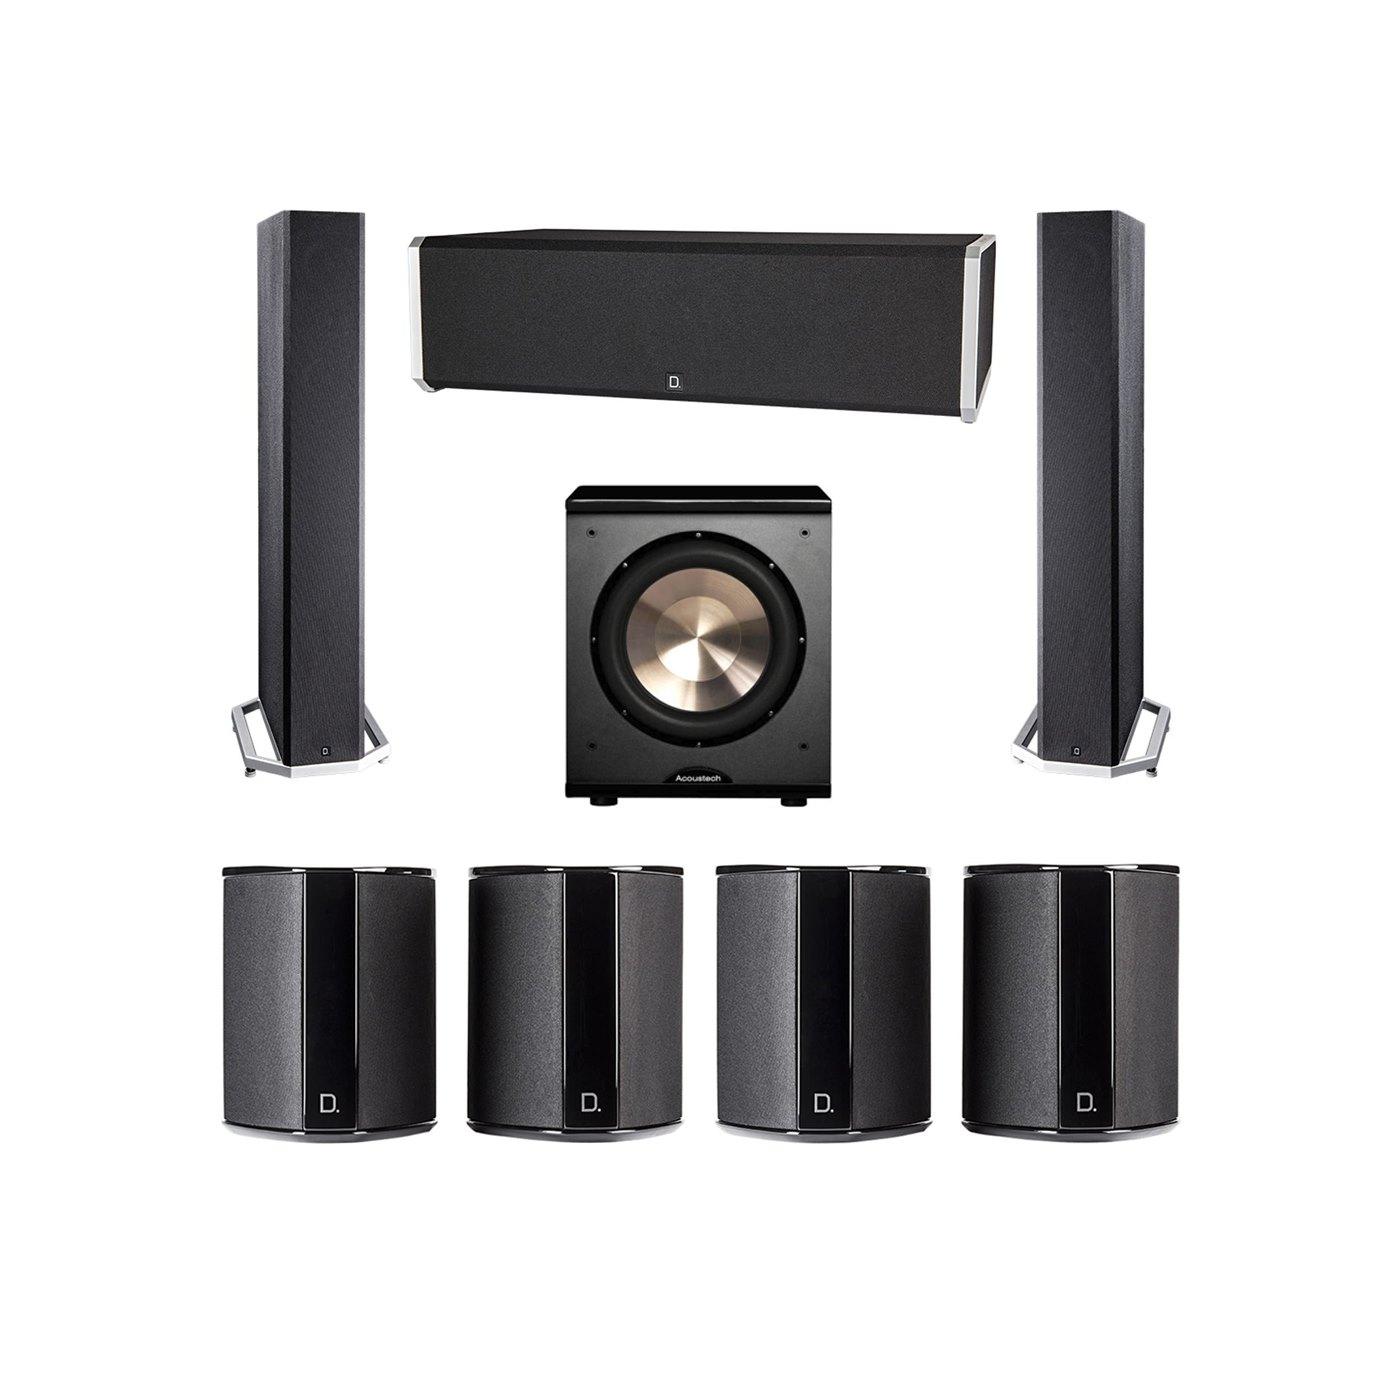 Definitive Technology 7.1 System with 2 BP9040 Tower Speakers, 1 CS9040 Center Channel Speaker, 4 SR9040 Surround Speaker, 1 BIC PL-200 Subwoofer